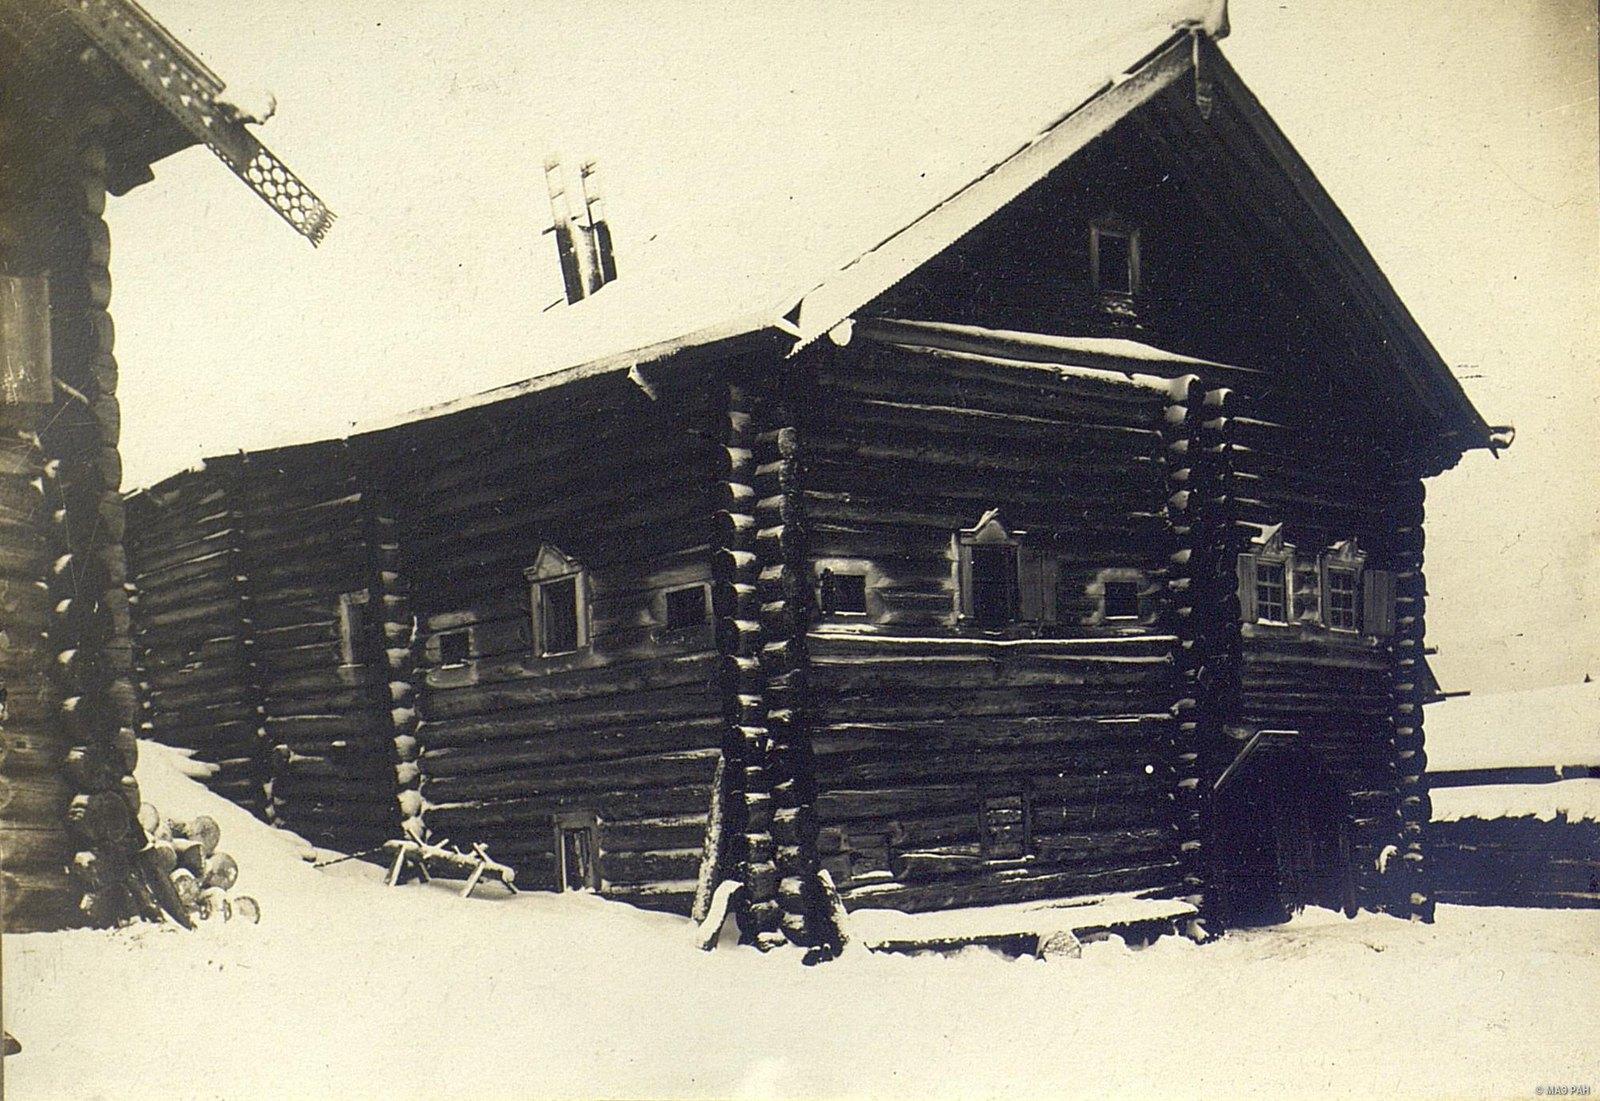 Мезень.  Тип дома со входом под избою